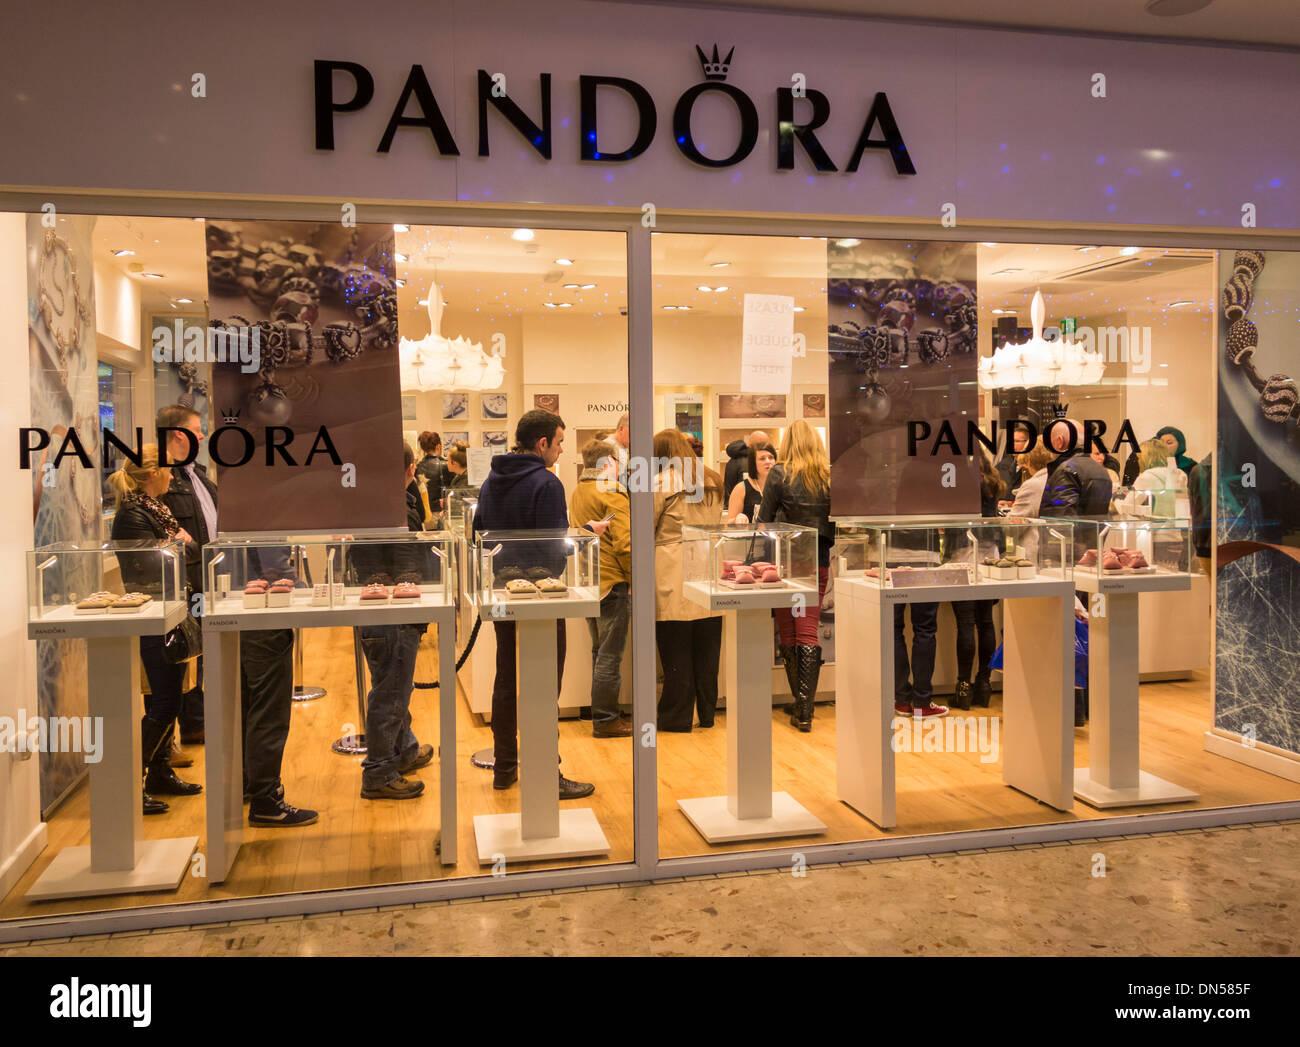 pandora shop in mauritius port pandora store locator in maryland